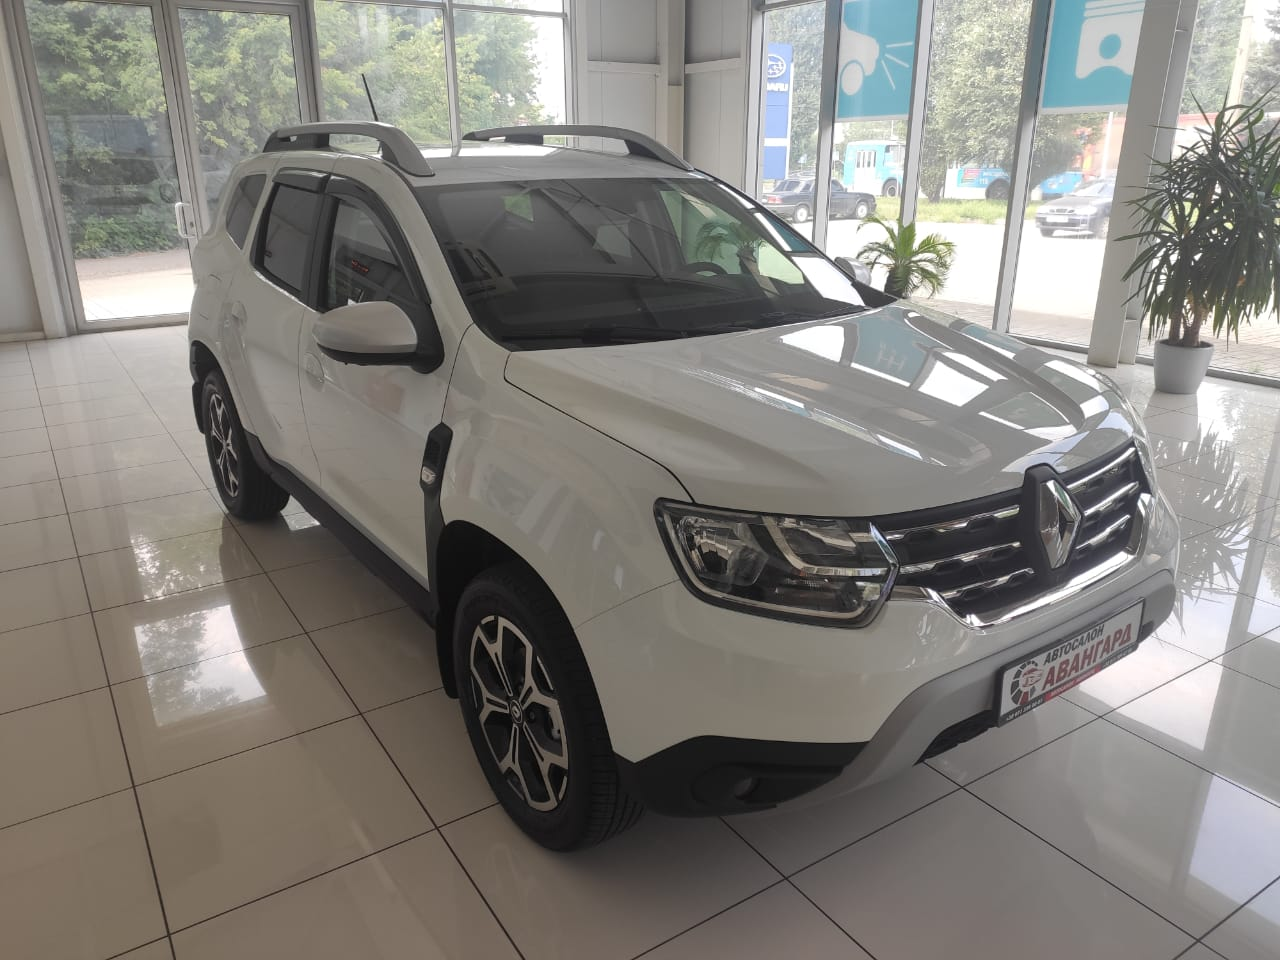 Renault Duster 2.0 4х4 6МКП. Style + СИСТЕМА КАМЕР КРУГОВОГО ОБЗОРА. Белый. 2021